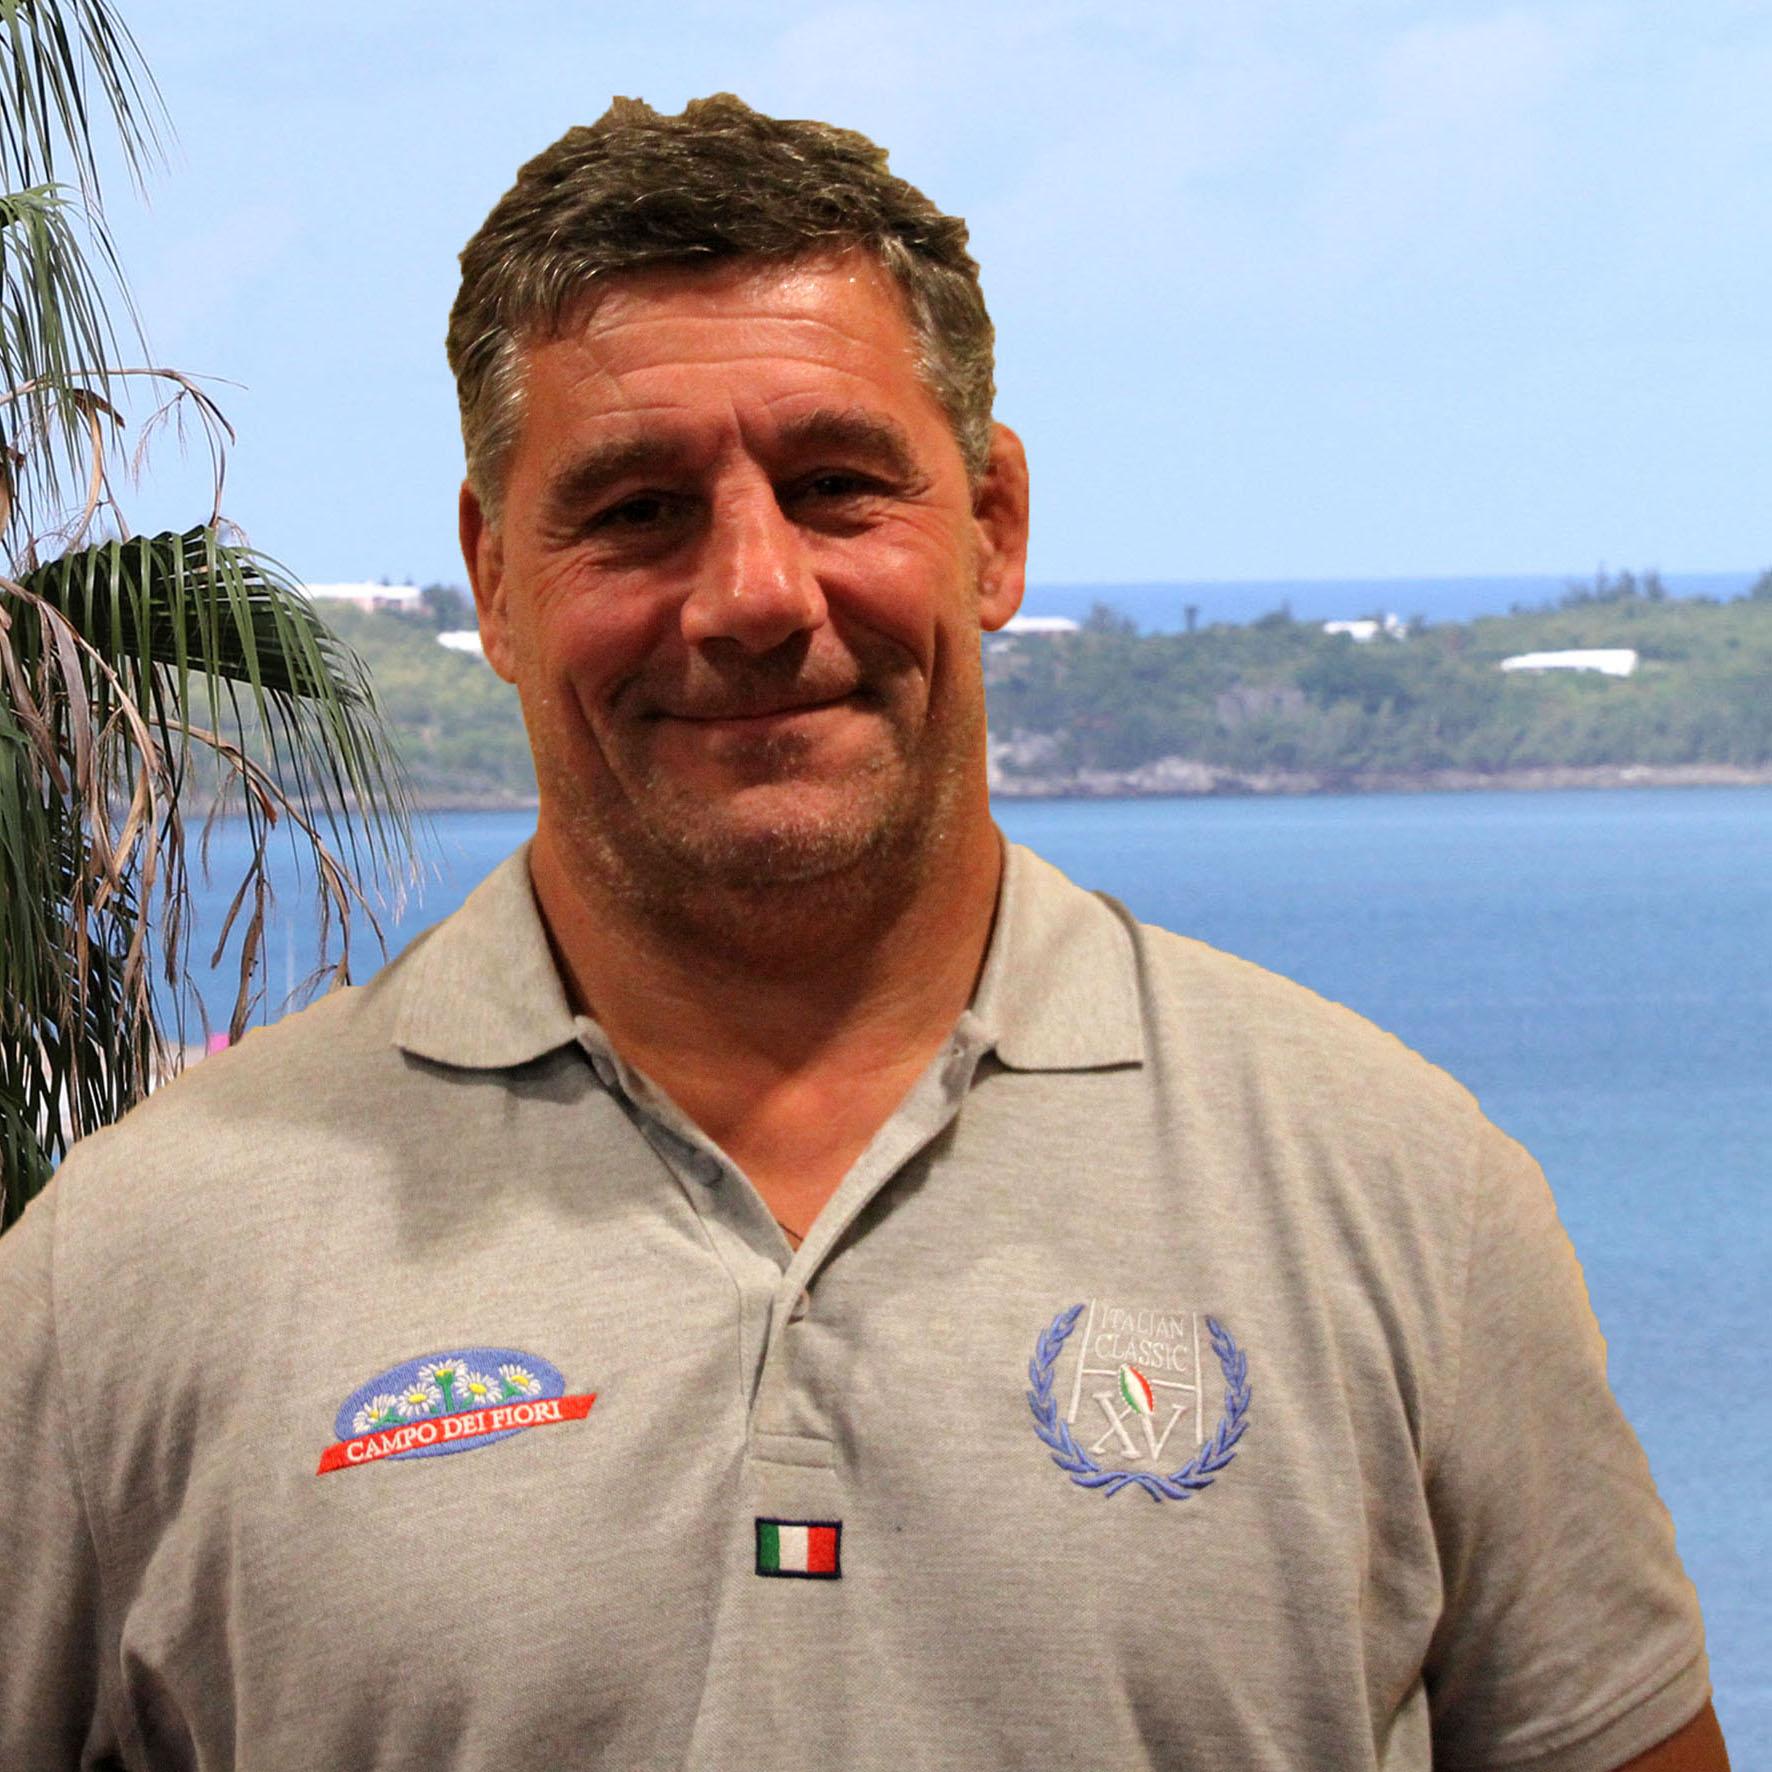 https://www.rugbyitalianclassicxv.com/wp-content/uploads/2019/04/WorldClassic2018_Bermuda_20181104_00_Cassina_ph_Turchetto.jpg